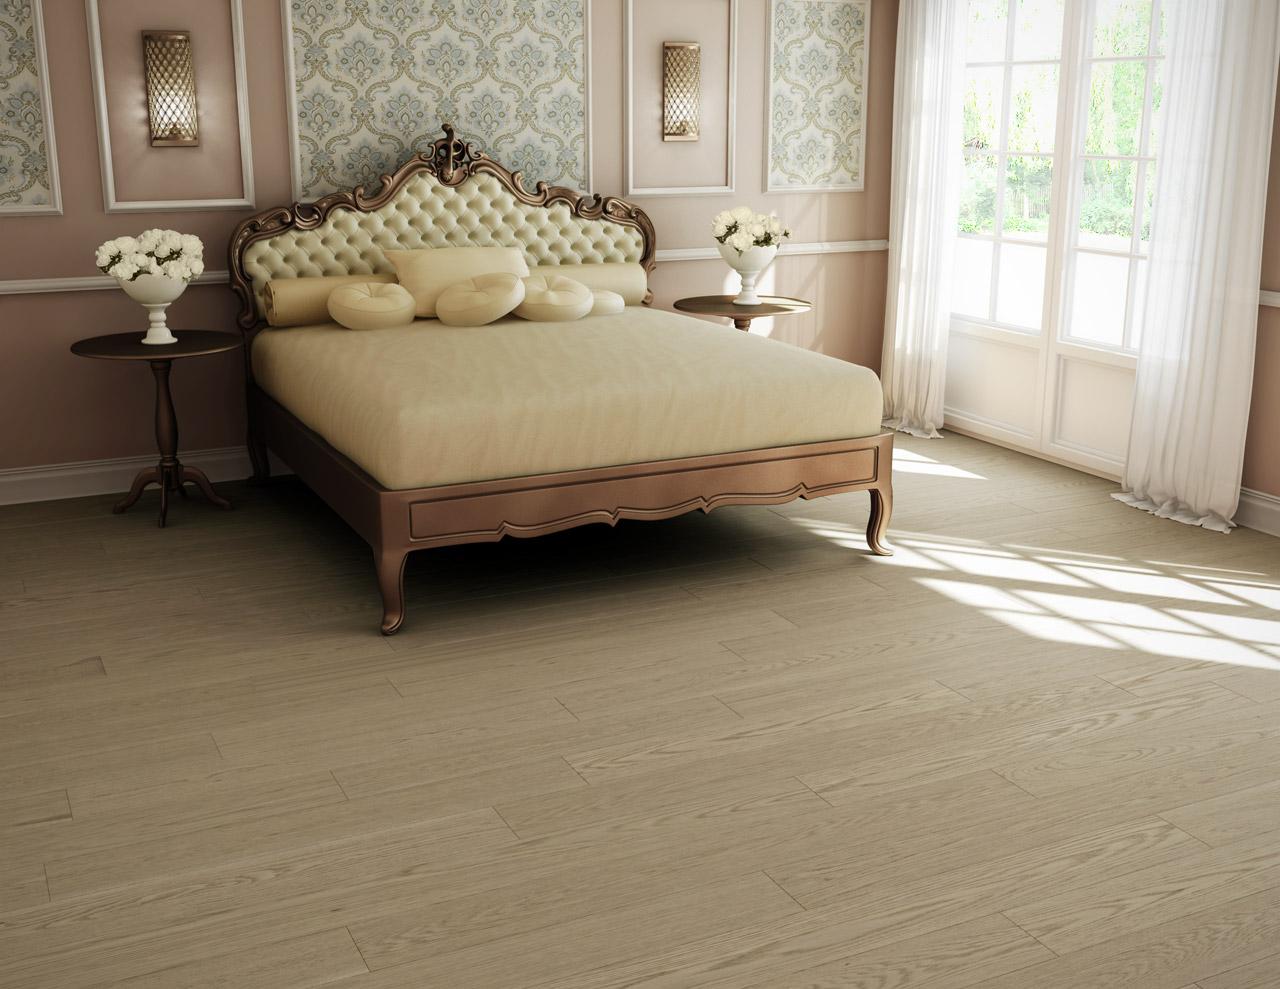 Classic luxurious bedroom